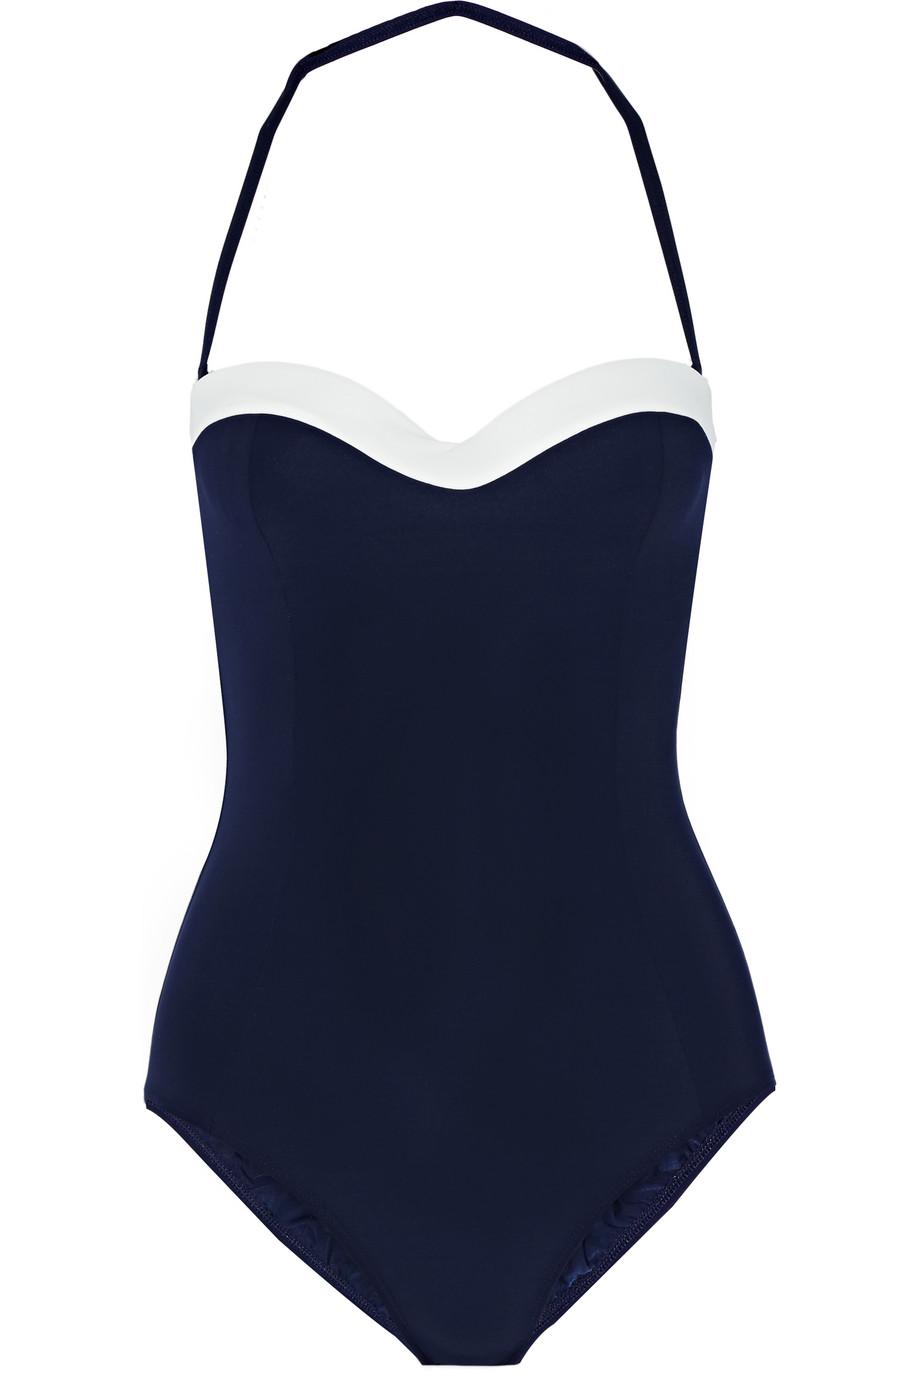 Tory Burch Two-Tone Swimsuit, Navy, Women's, Size: XS